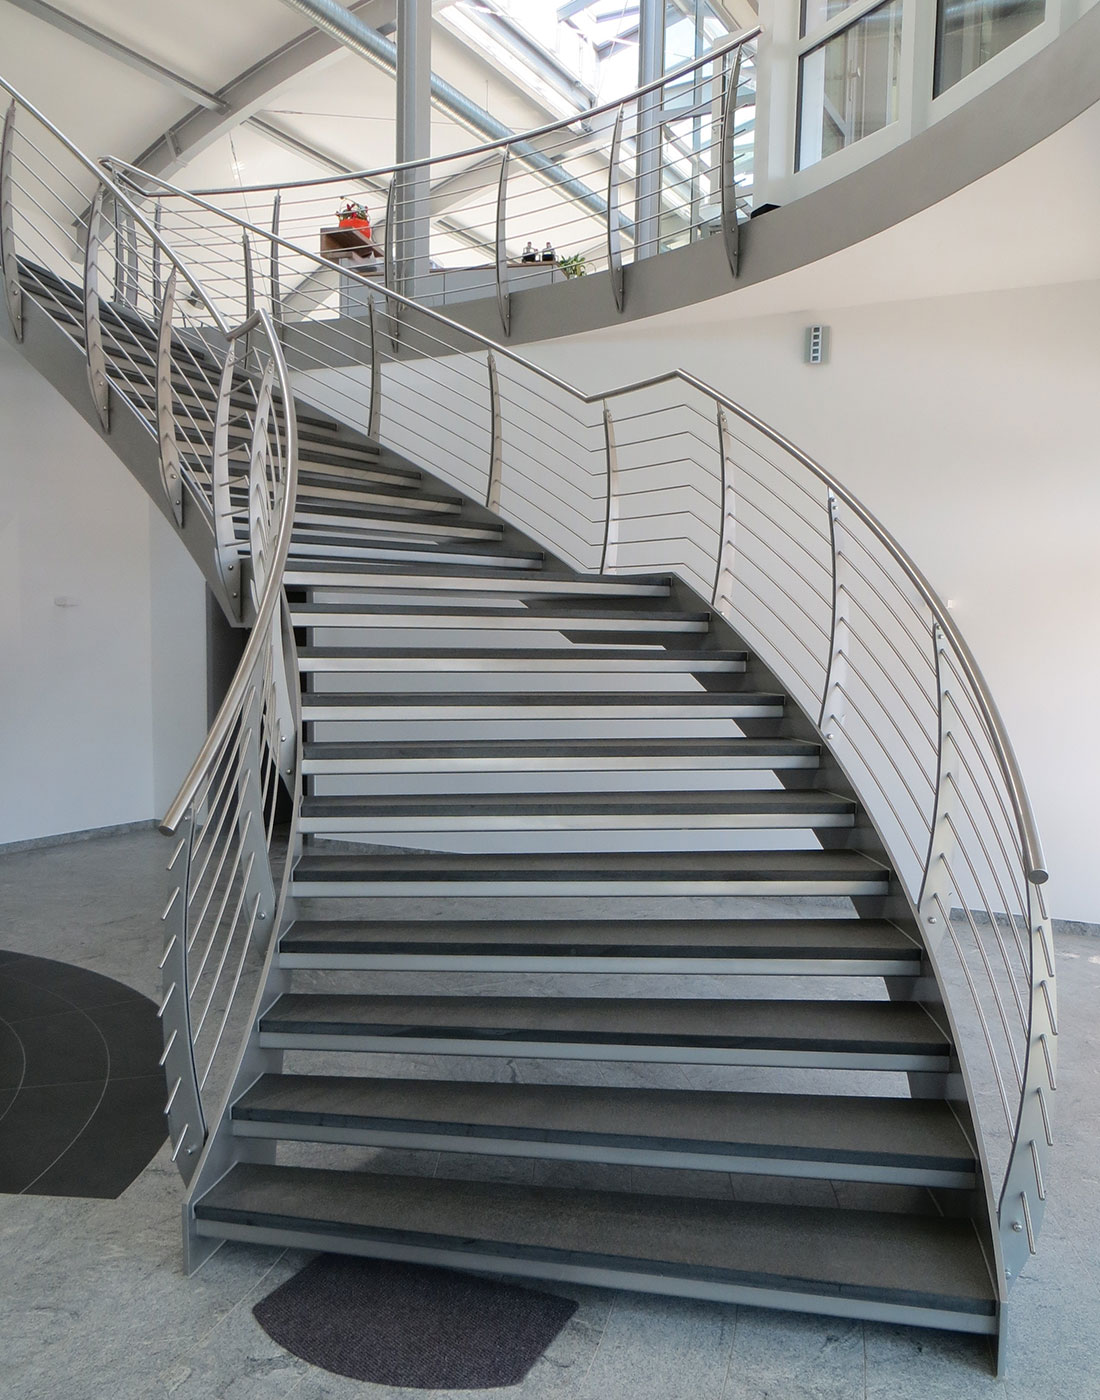 treppen partner pietsch partner gmbh plz 99974 m hlhausen wangen flachstahl steintreppe. Black Bedroom Furniture Sets. Home Design Ideas